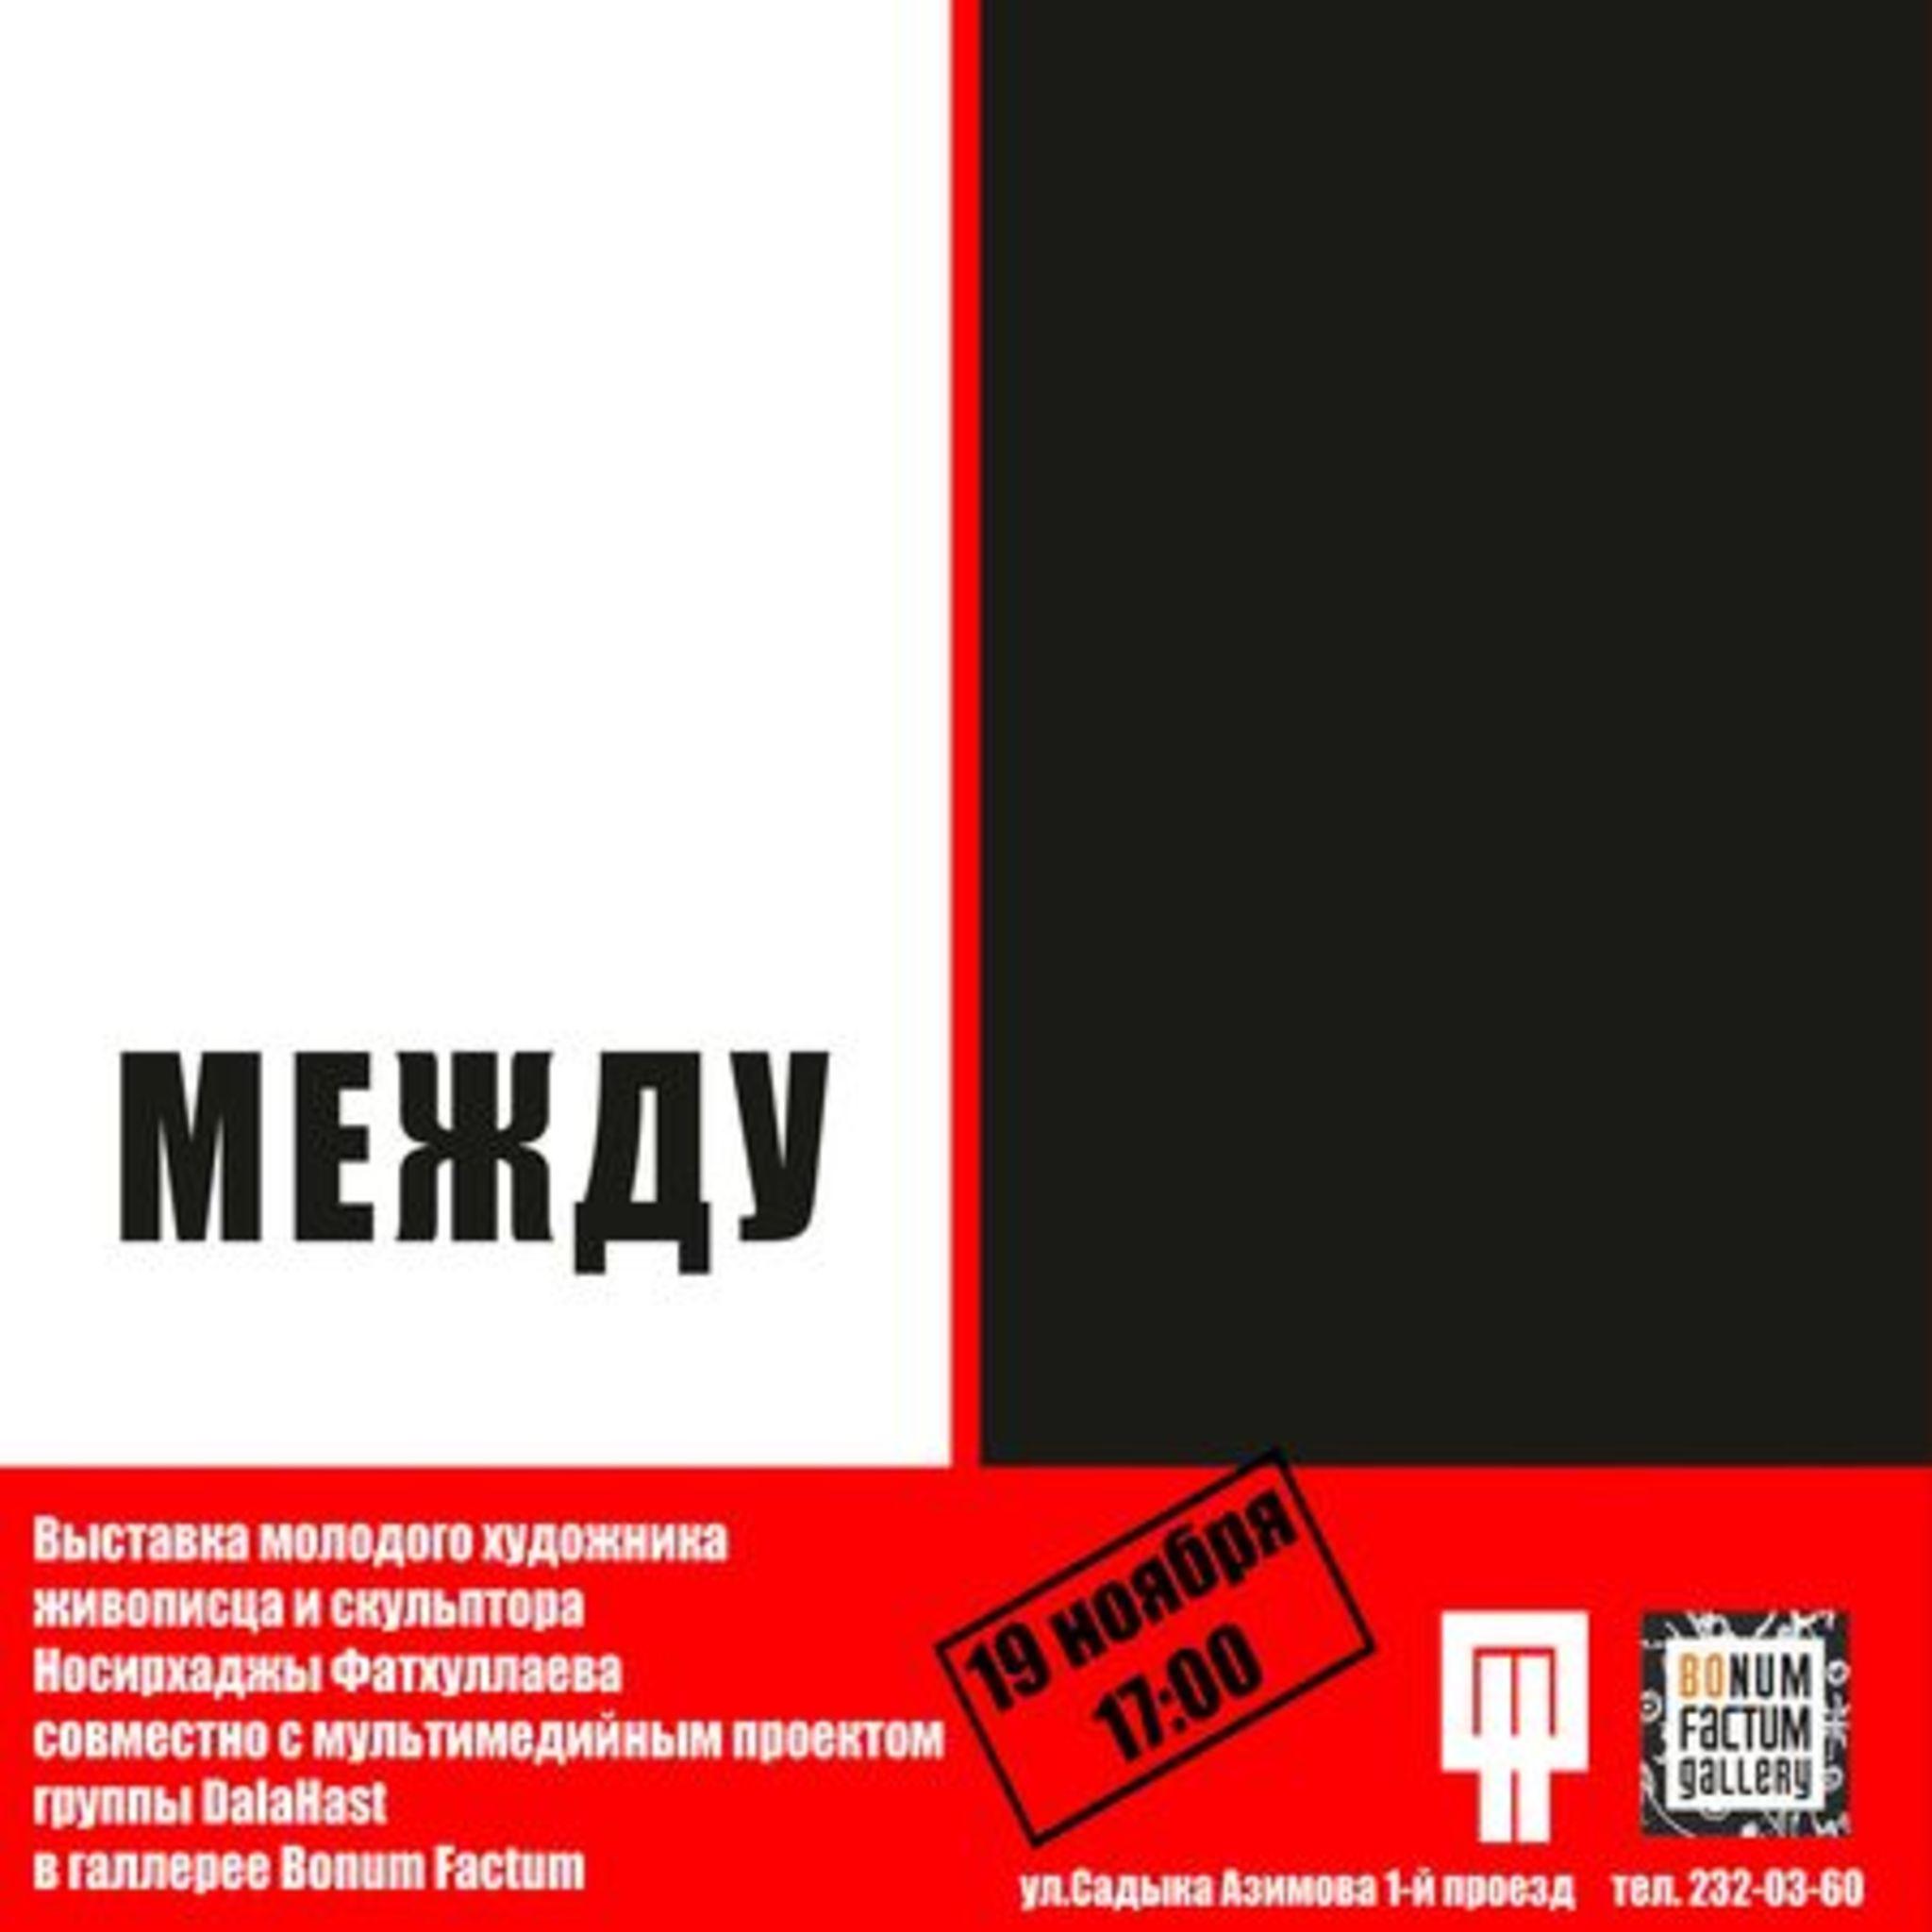 Выставка Носирходжи Фатхуллаева «Между»